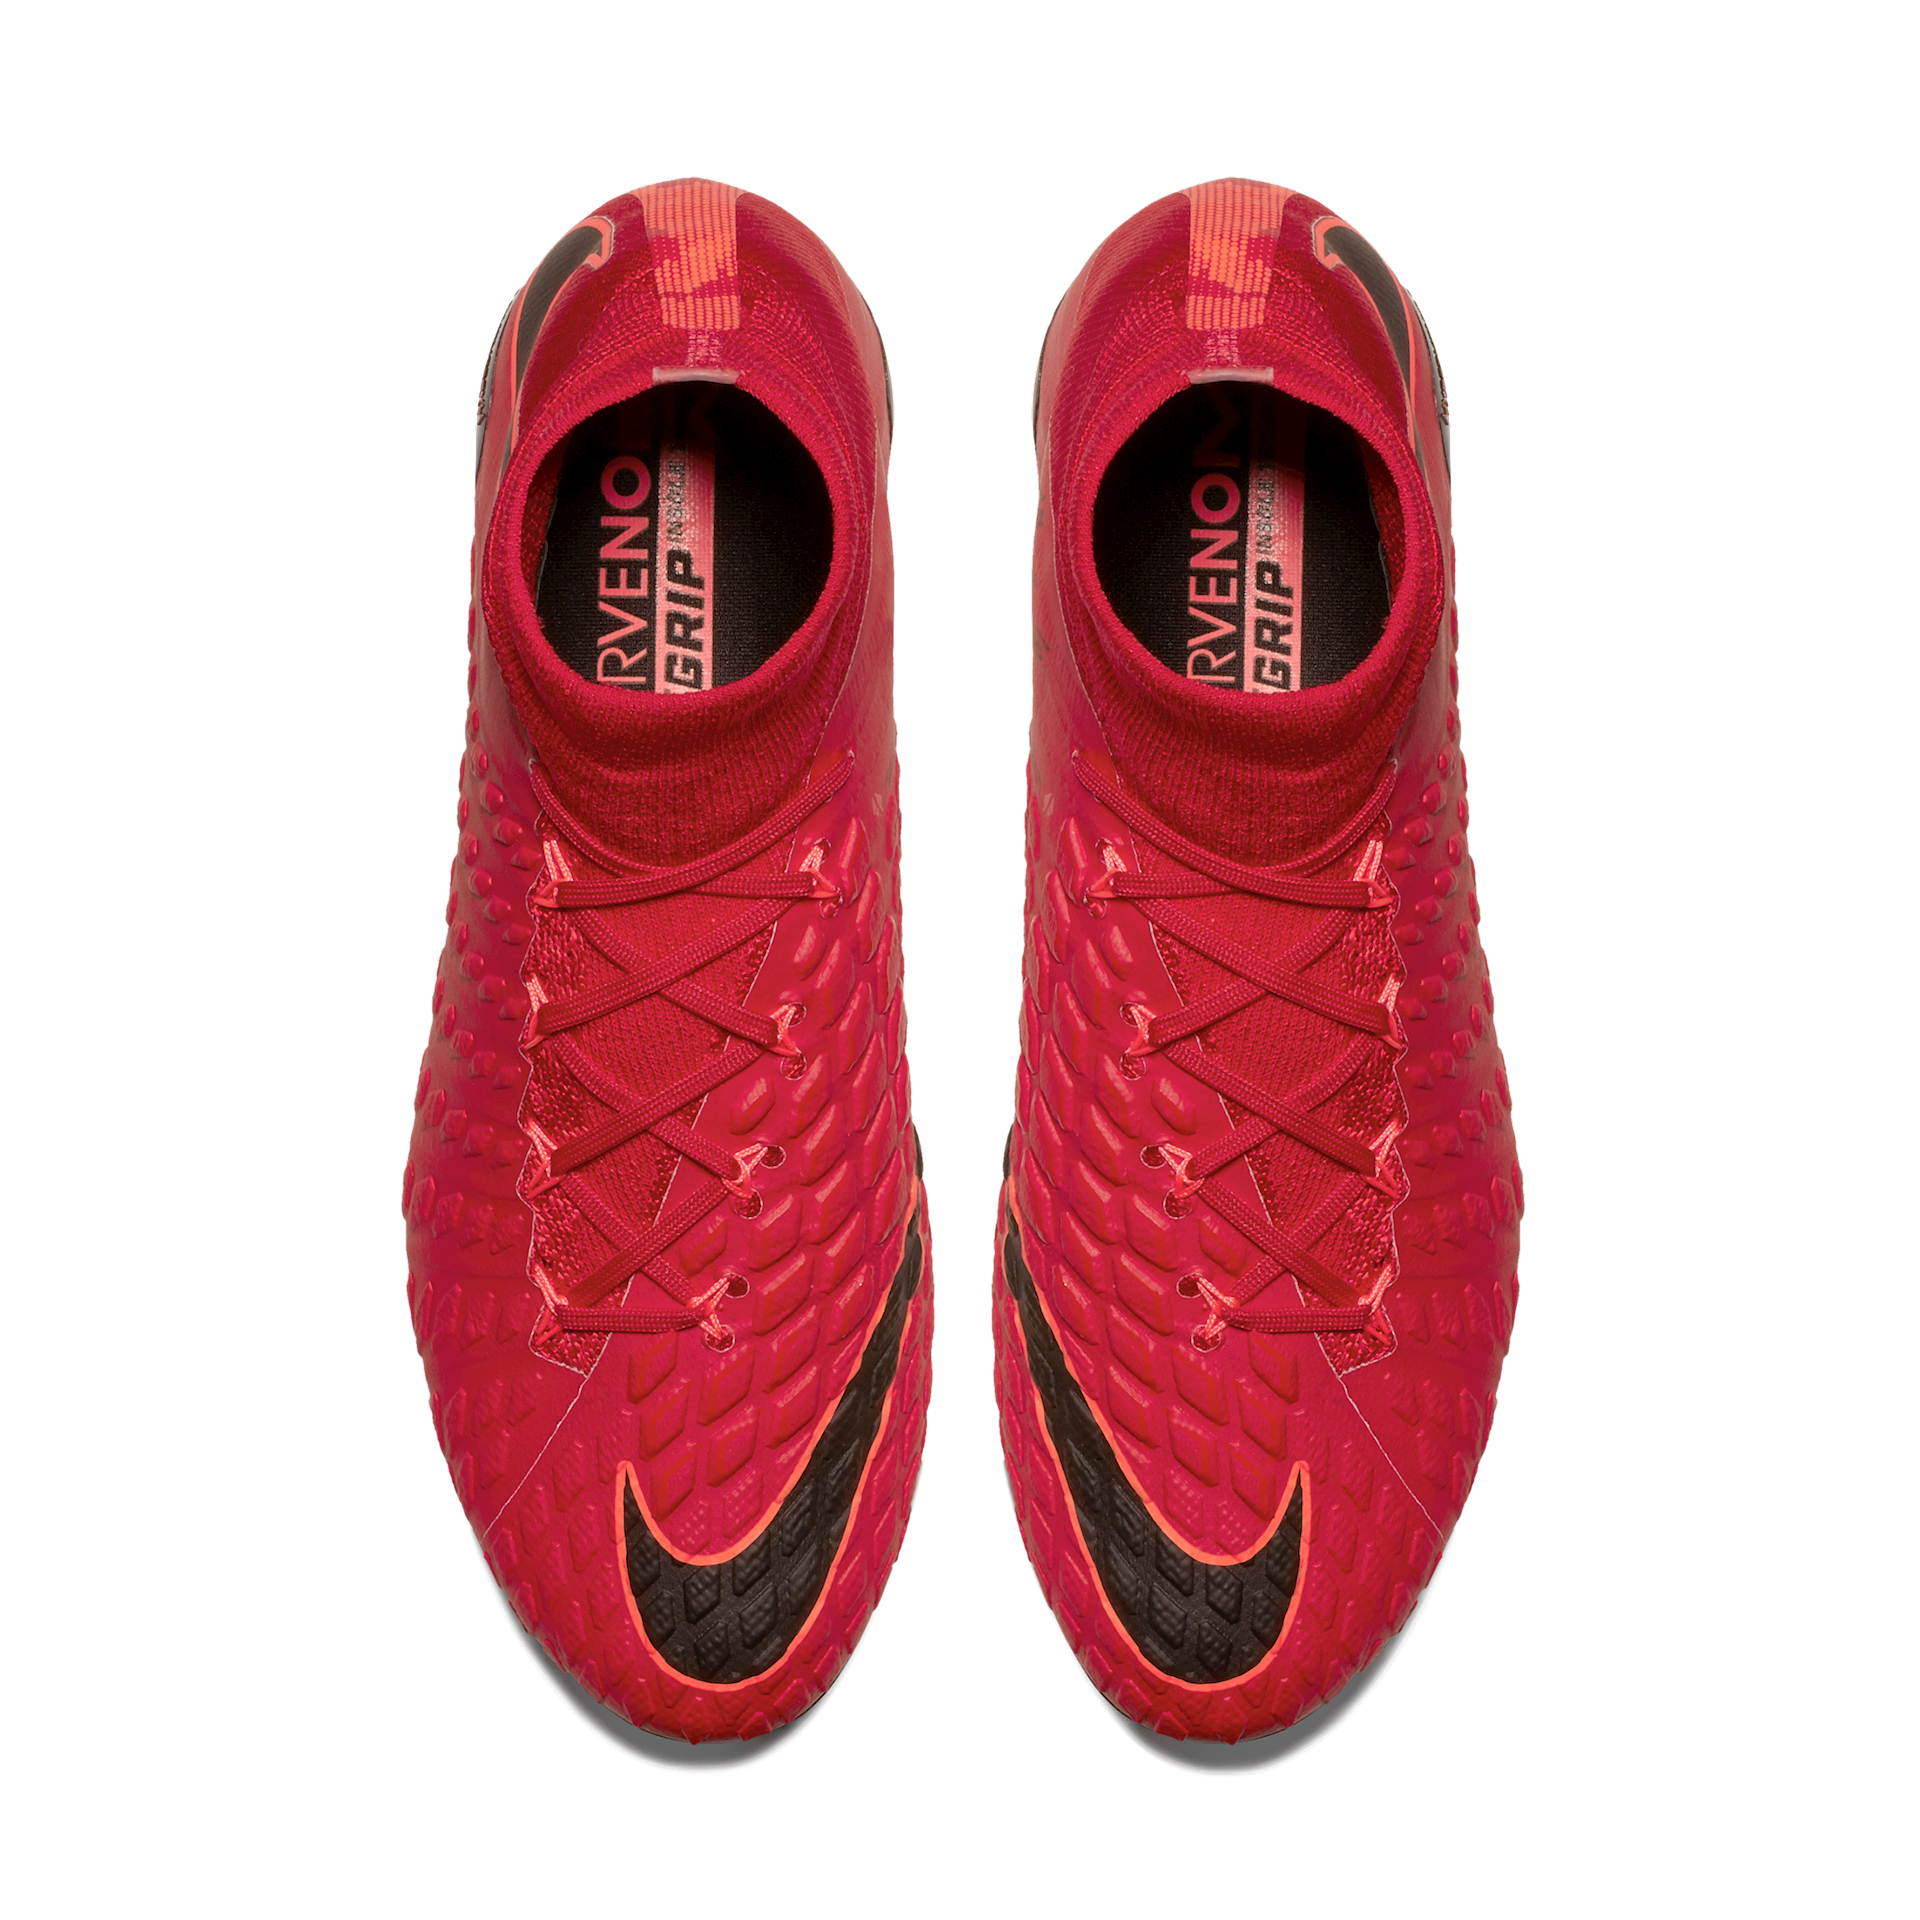 Nike Hypervenom Phantom III PLAY FIRE voetbalsch Voetbal